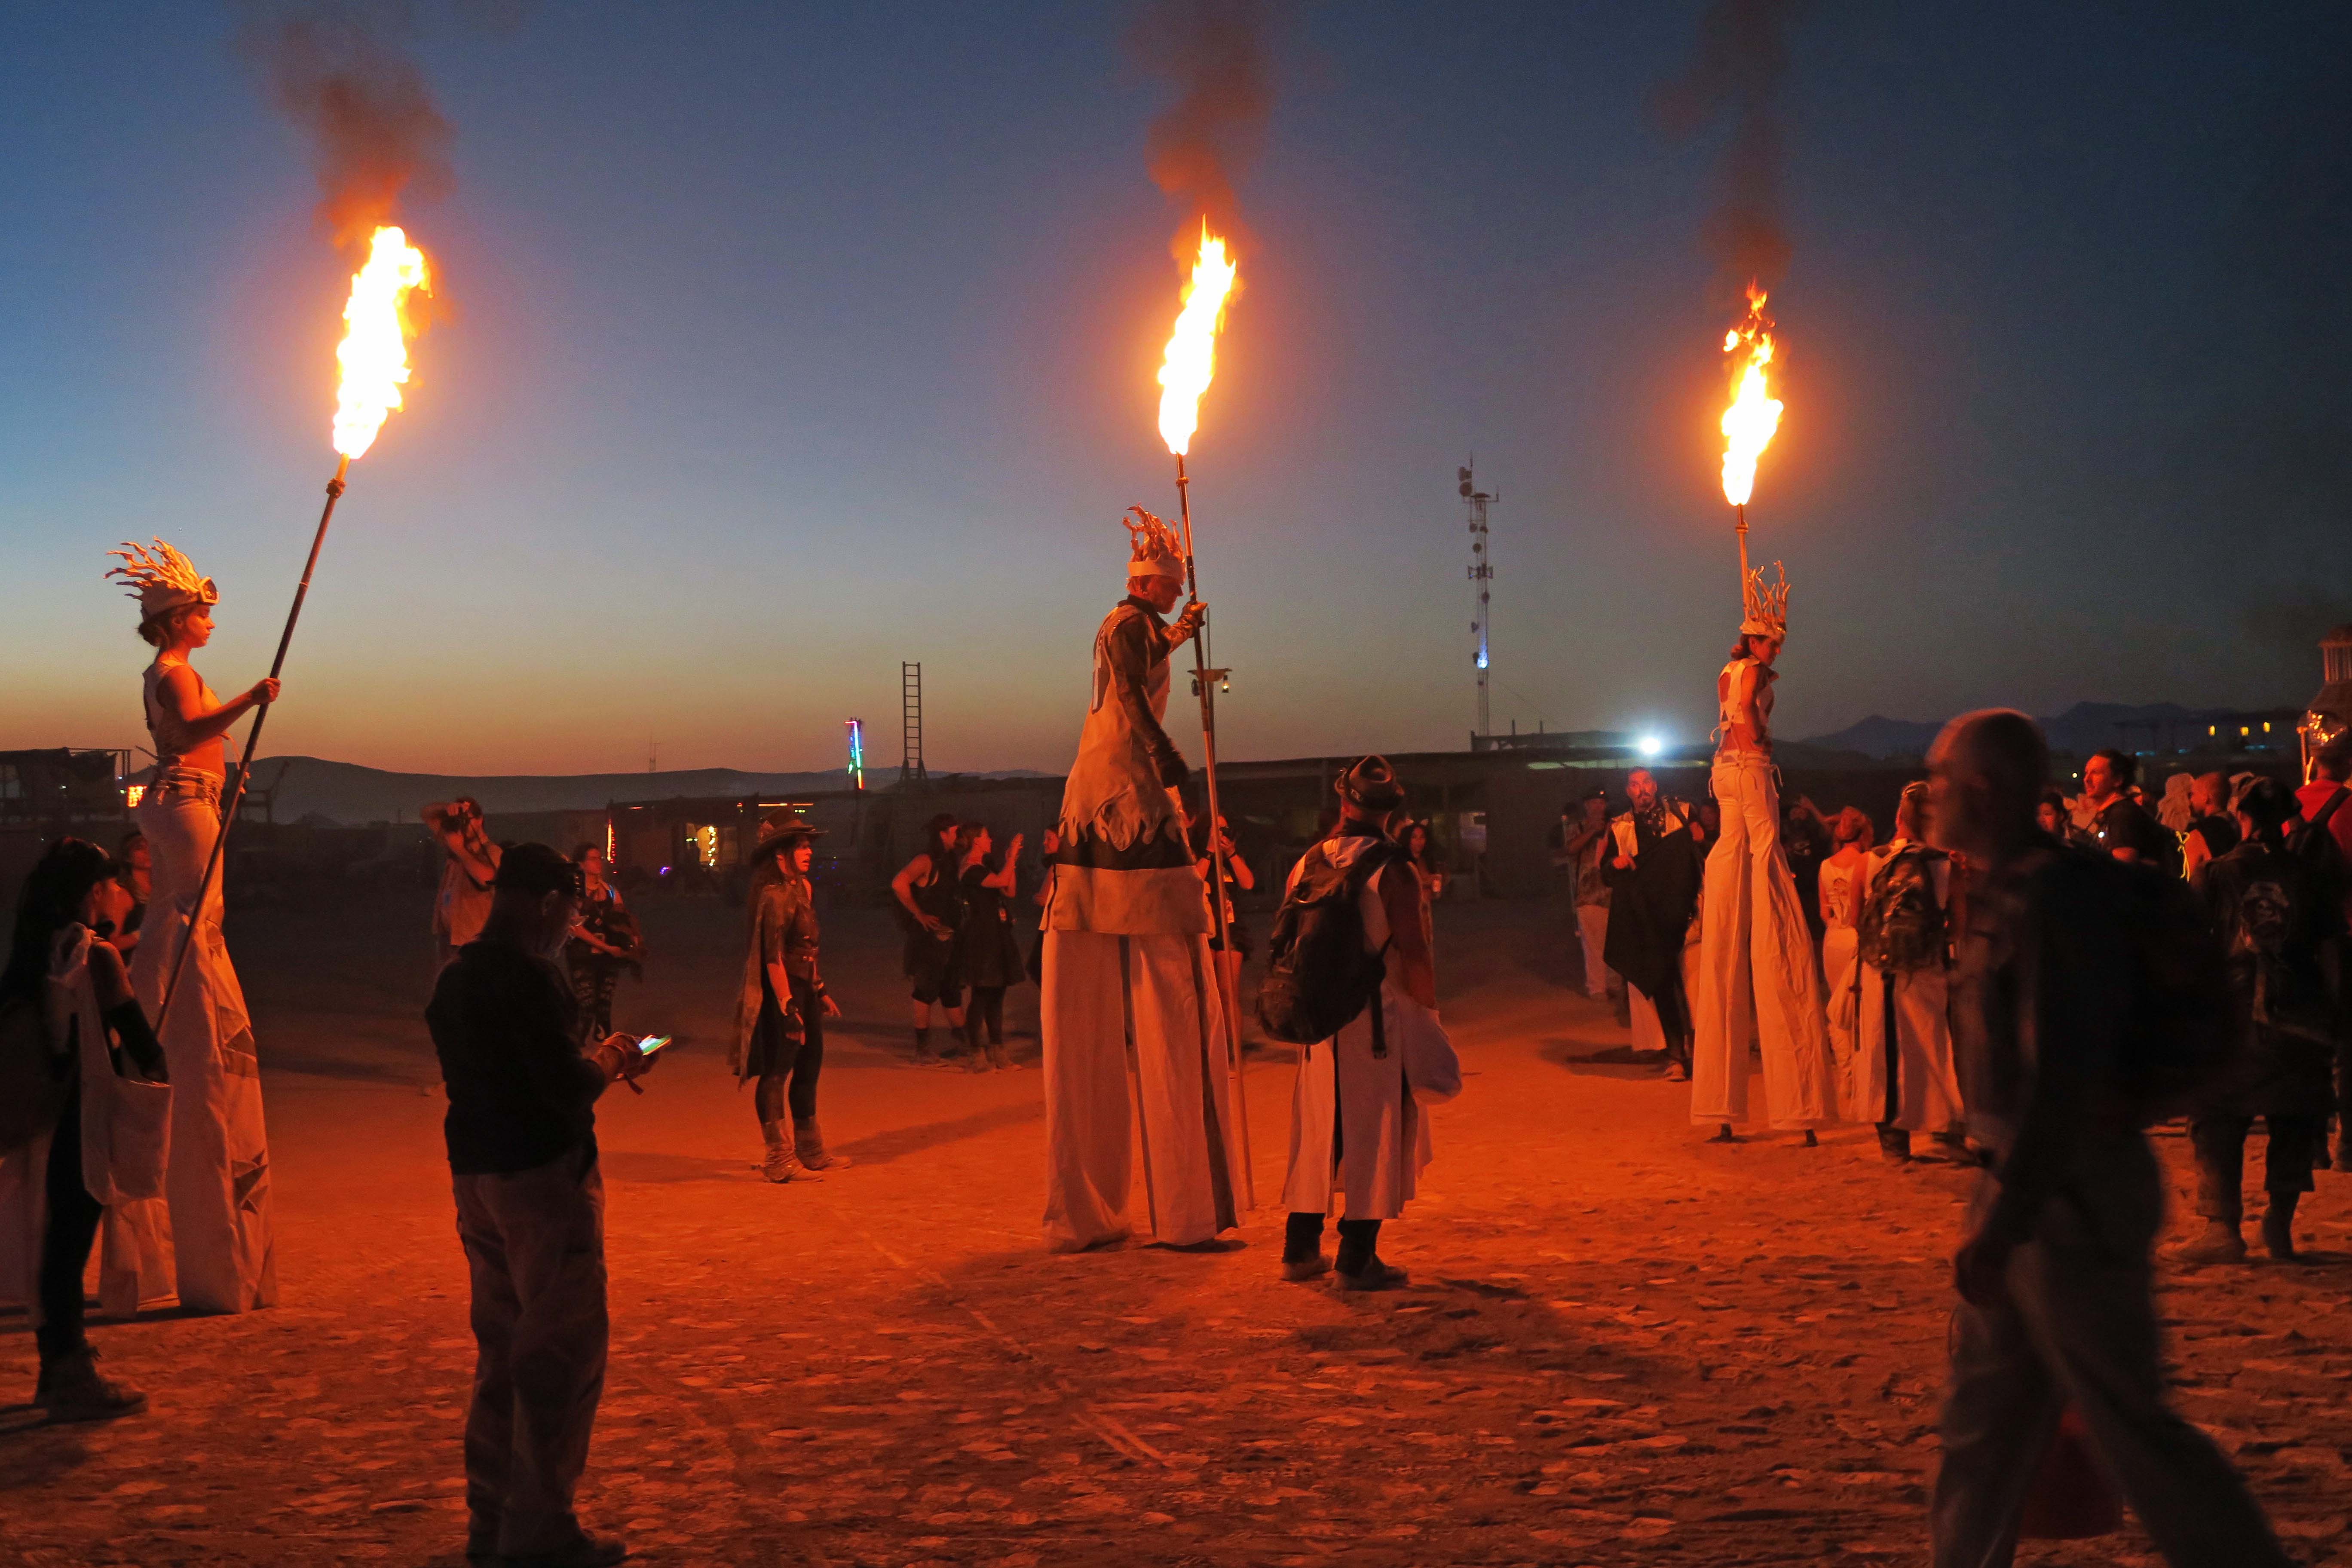 Stilt walkers on way to lighting of the Man, Burning Man 2017